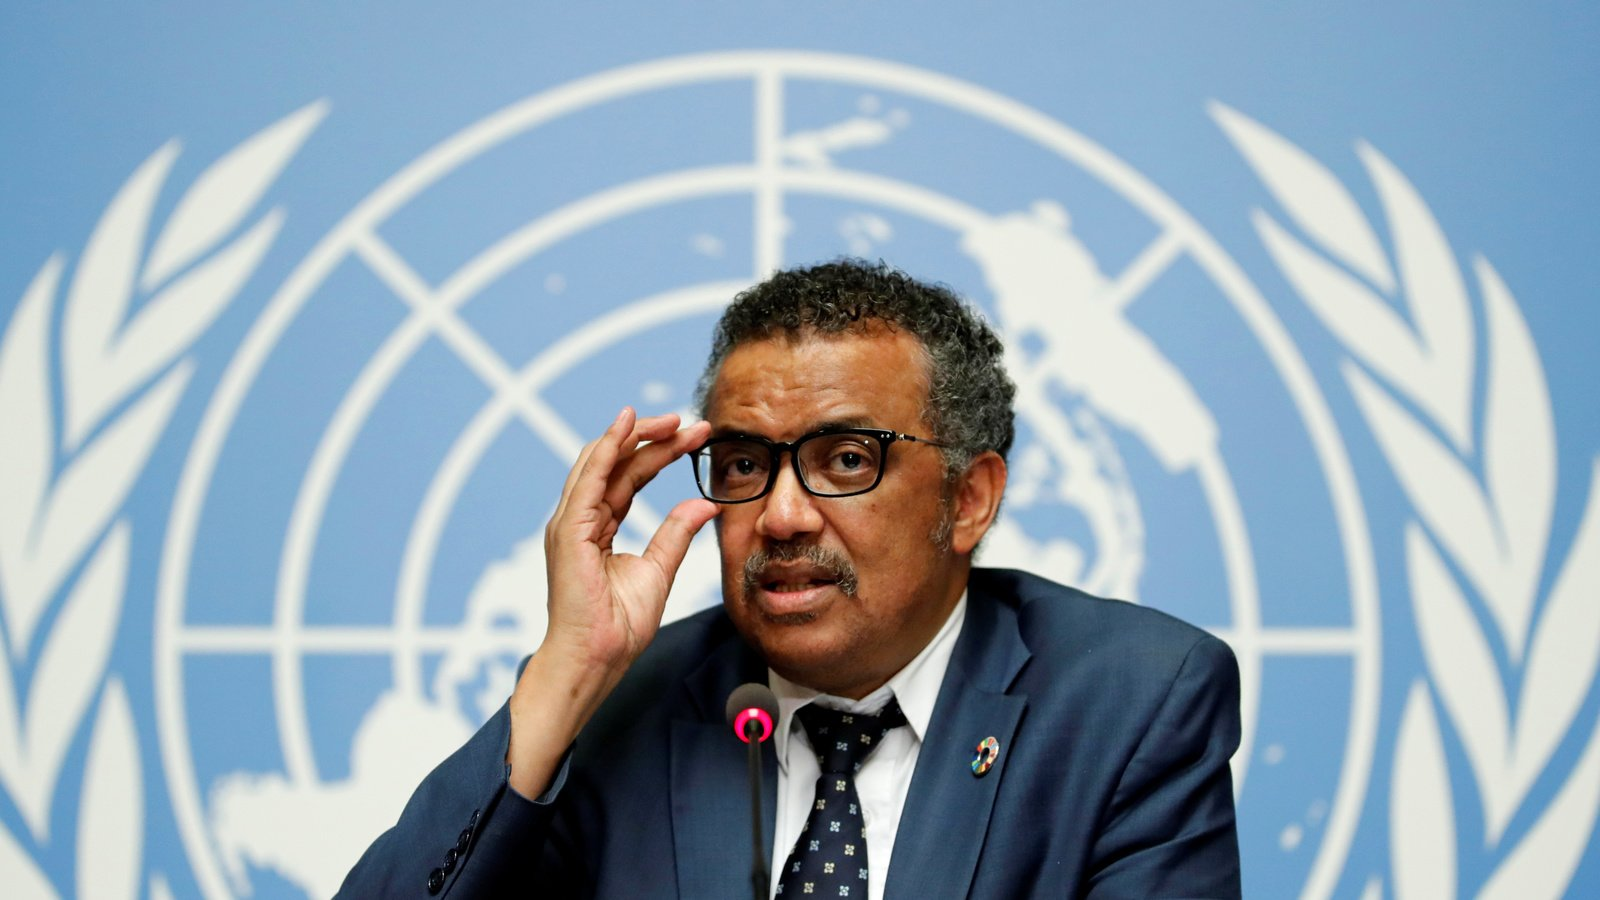 Tedros Adhanom Ghebreyesus, director-general of the World Health Organization